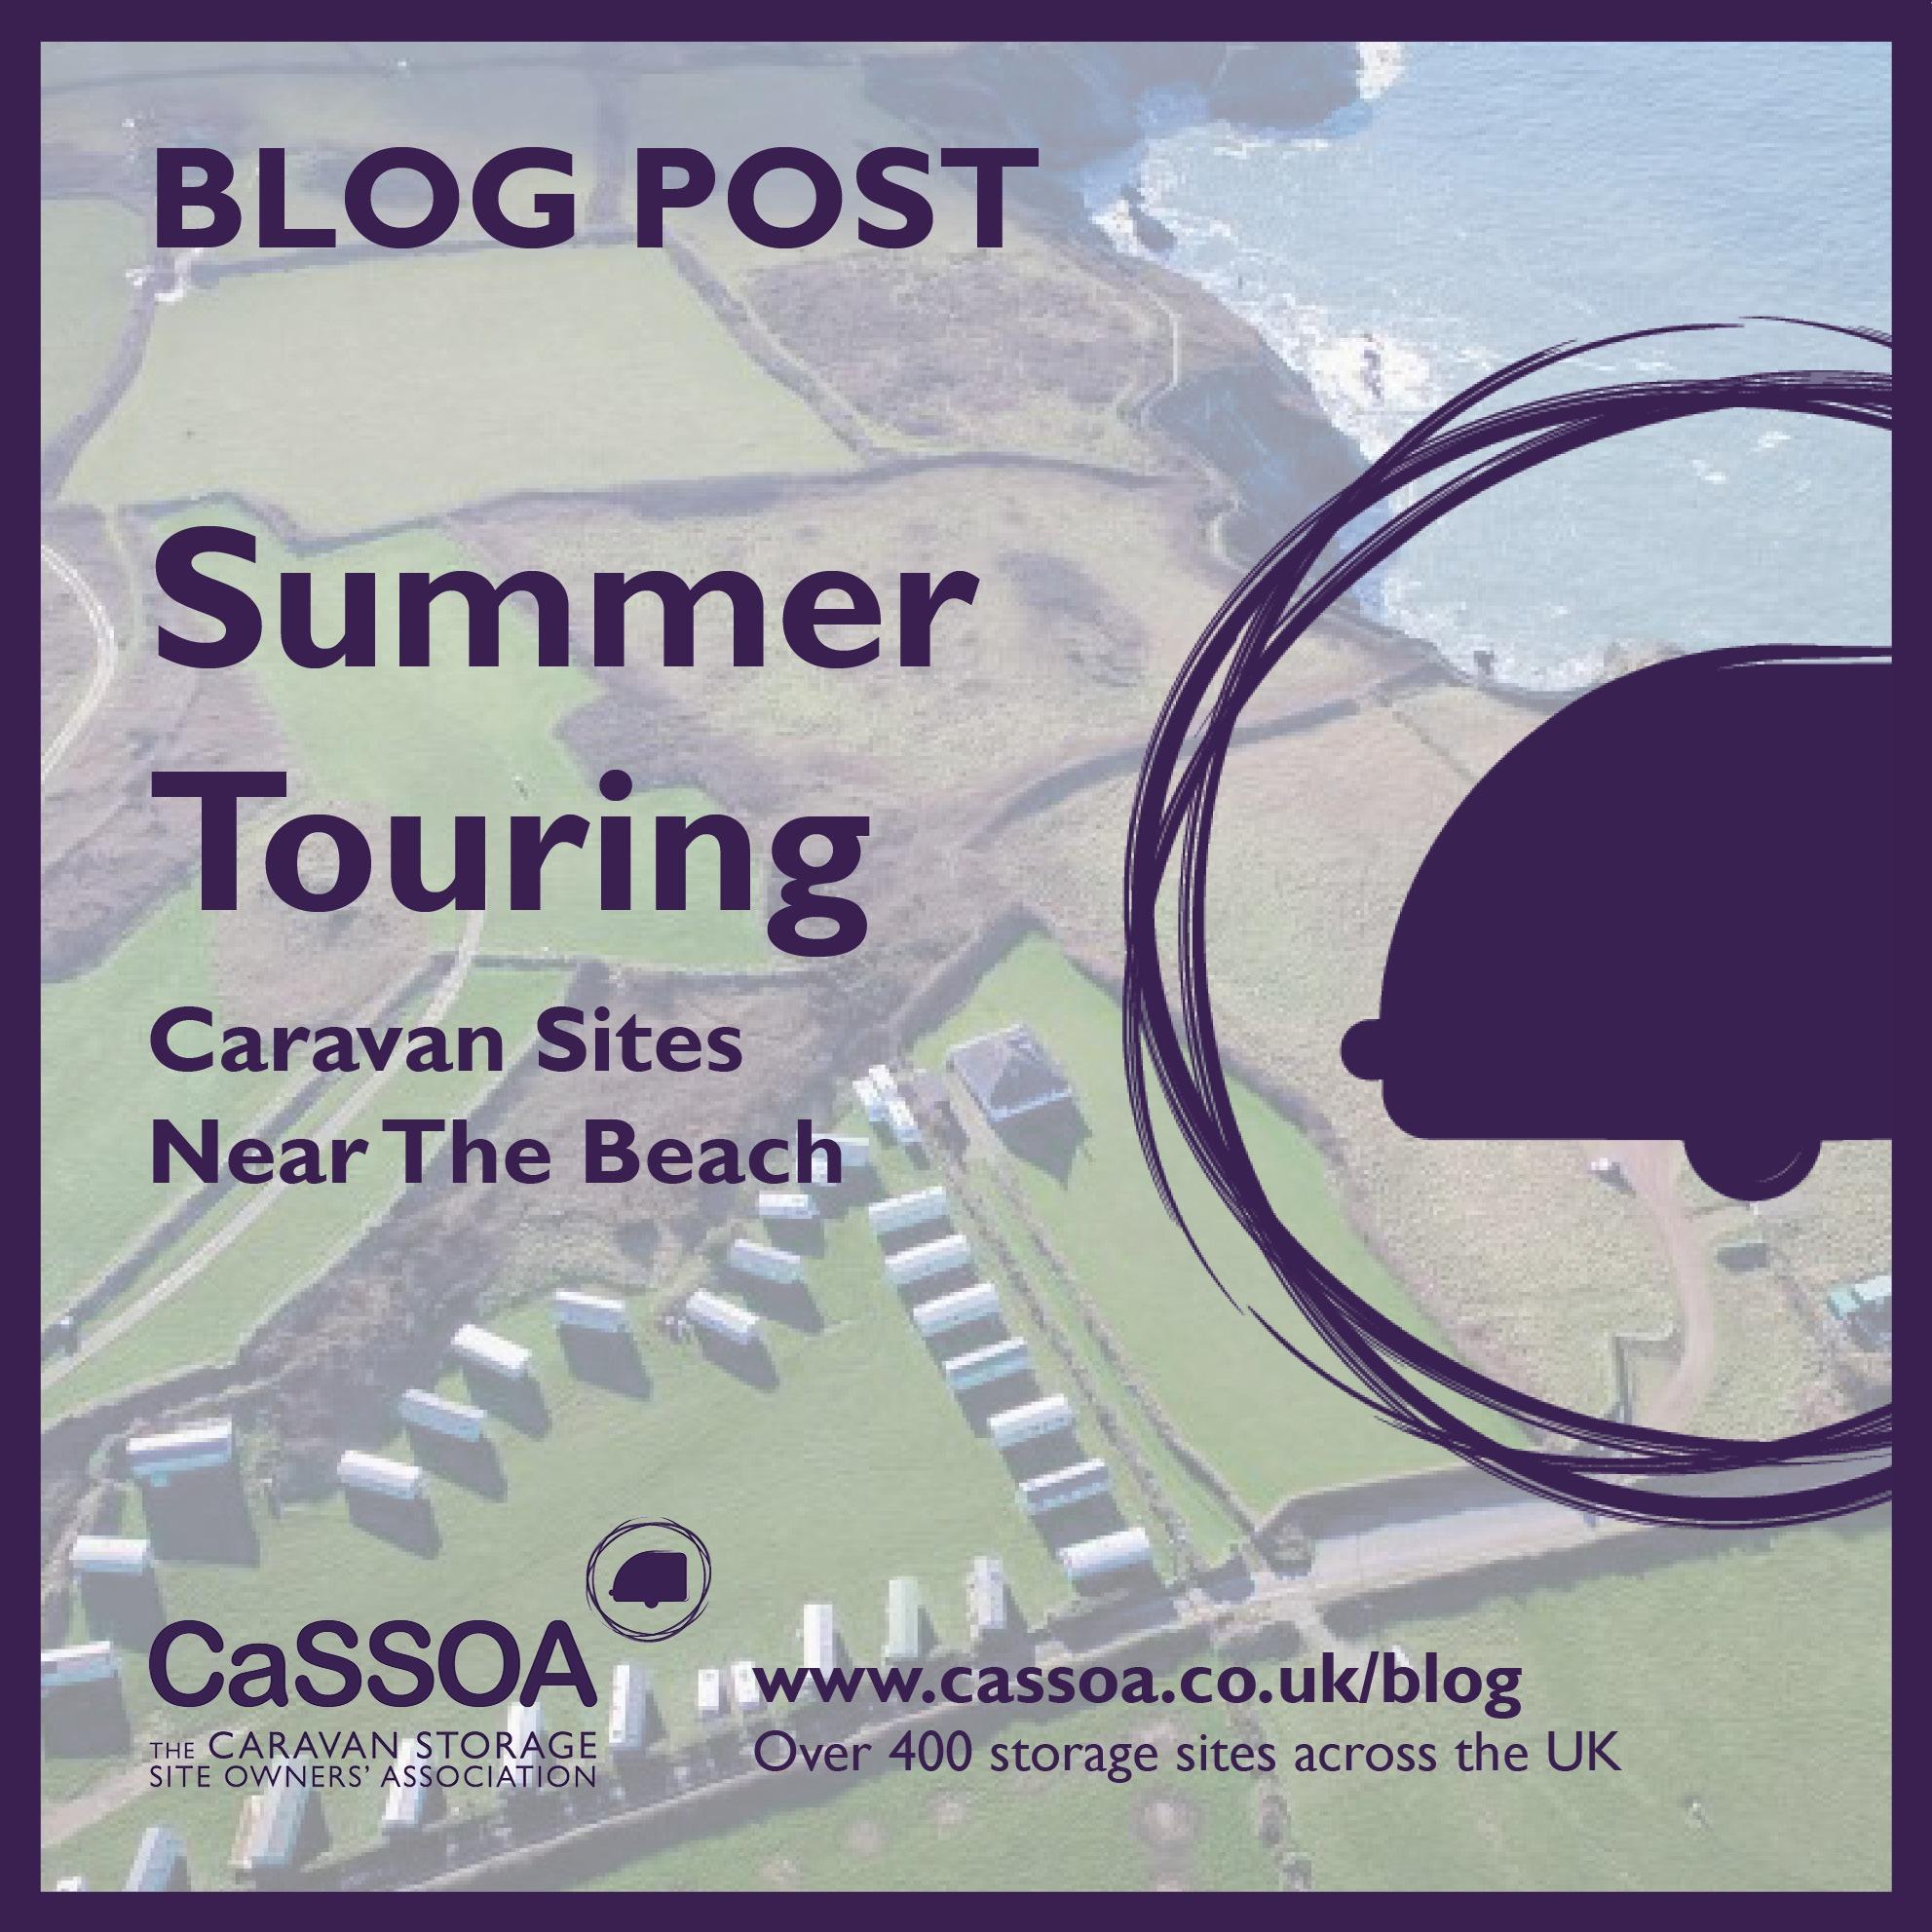 Summer Touring